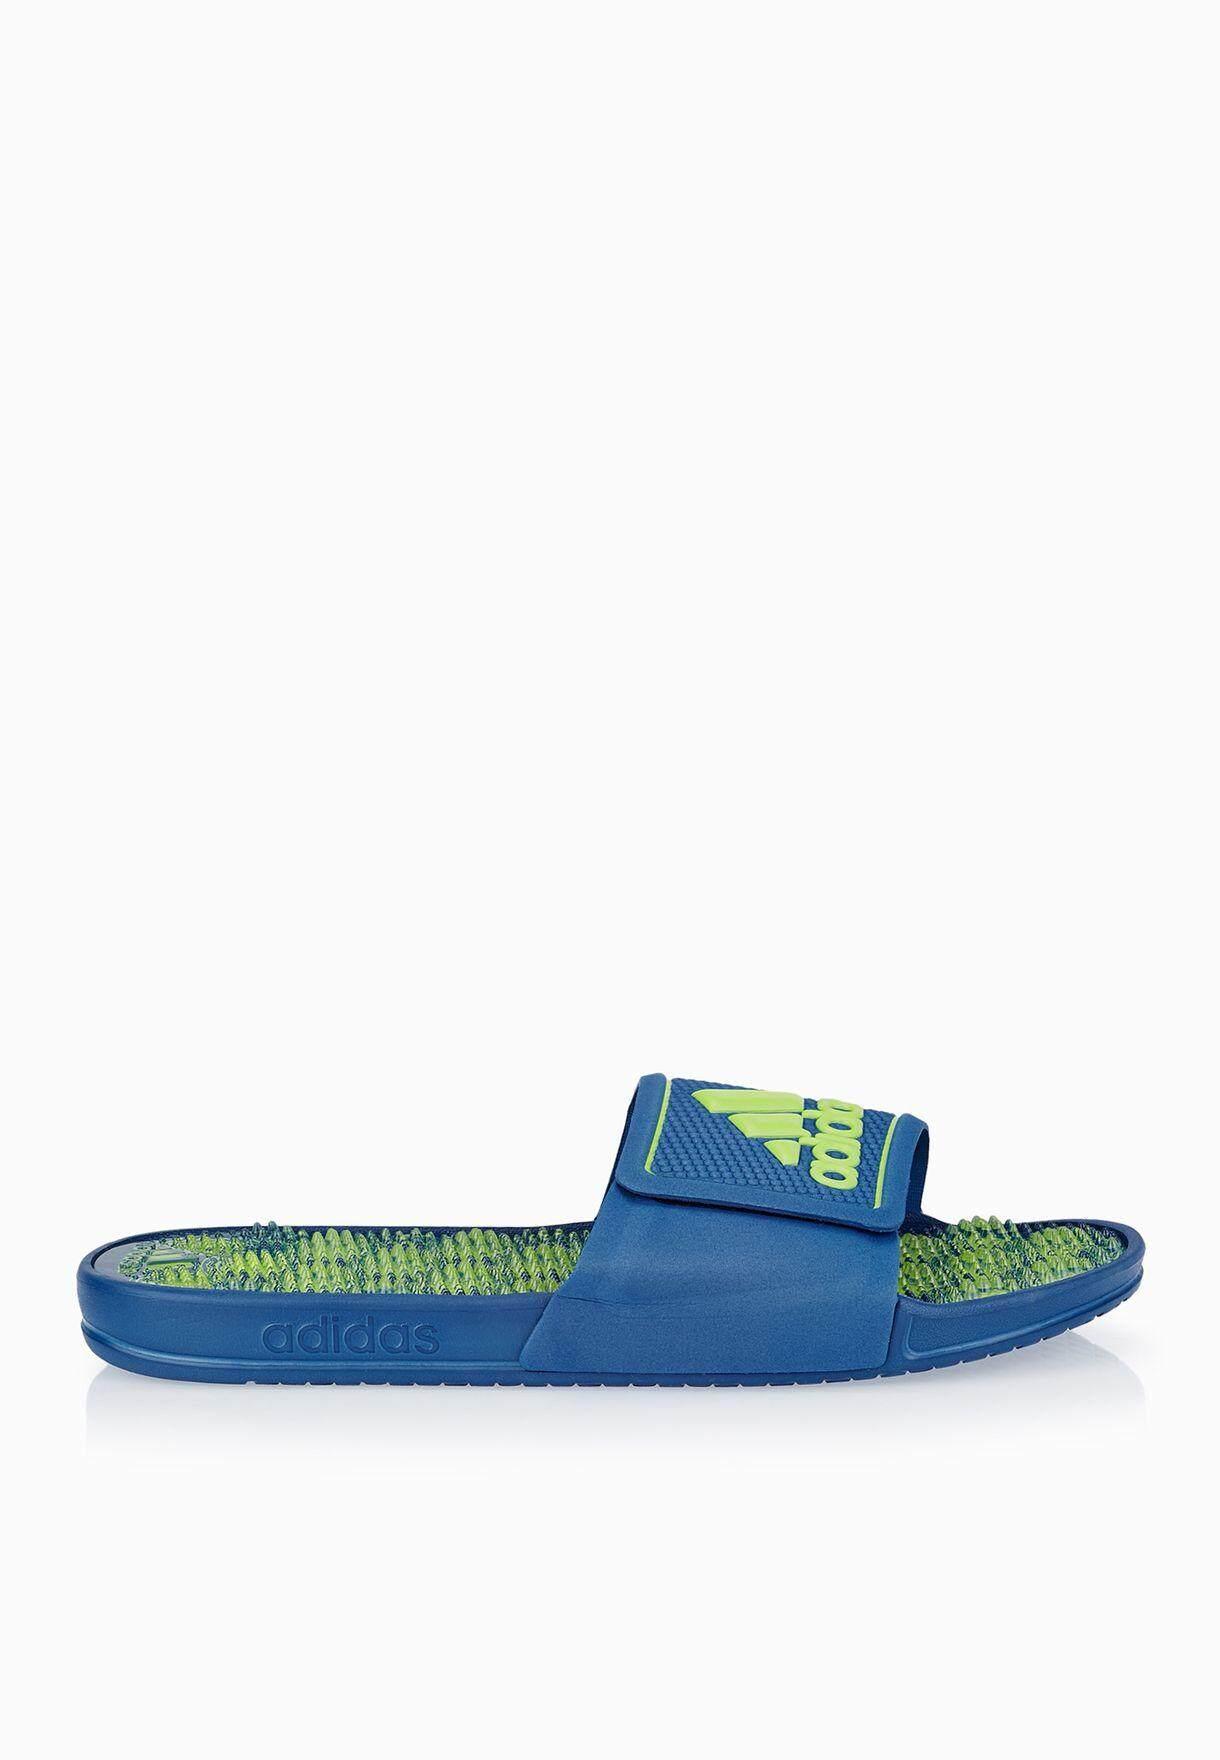 more photos 1caf9 eac6c adidas Adissage 2.0 Sandal - Blue